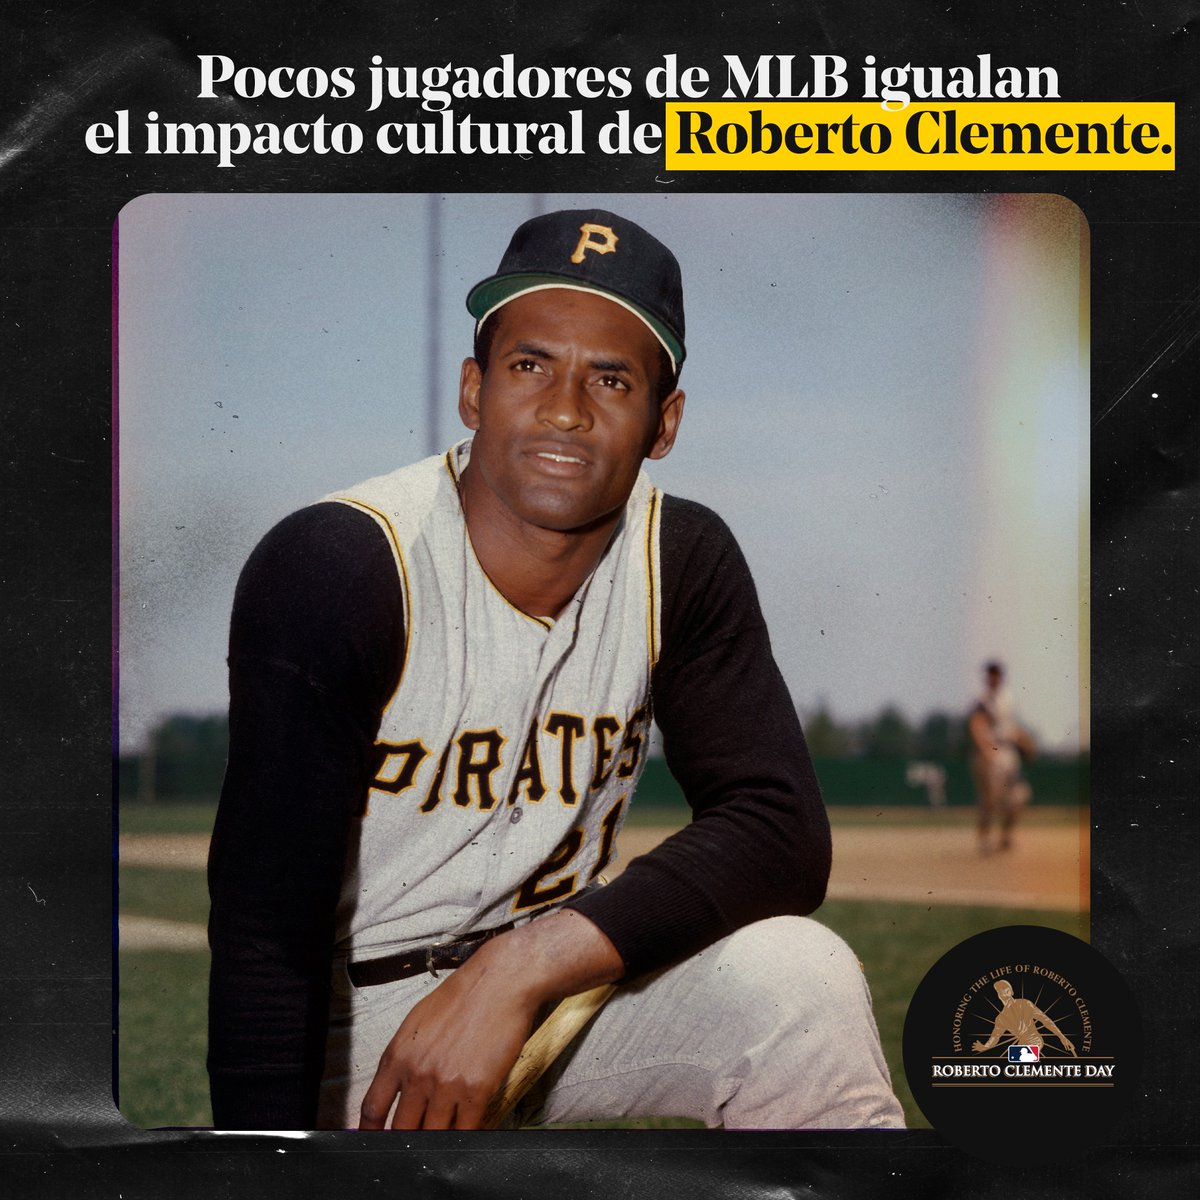 @MLBVenezuela's photo on Roberto Clemente